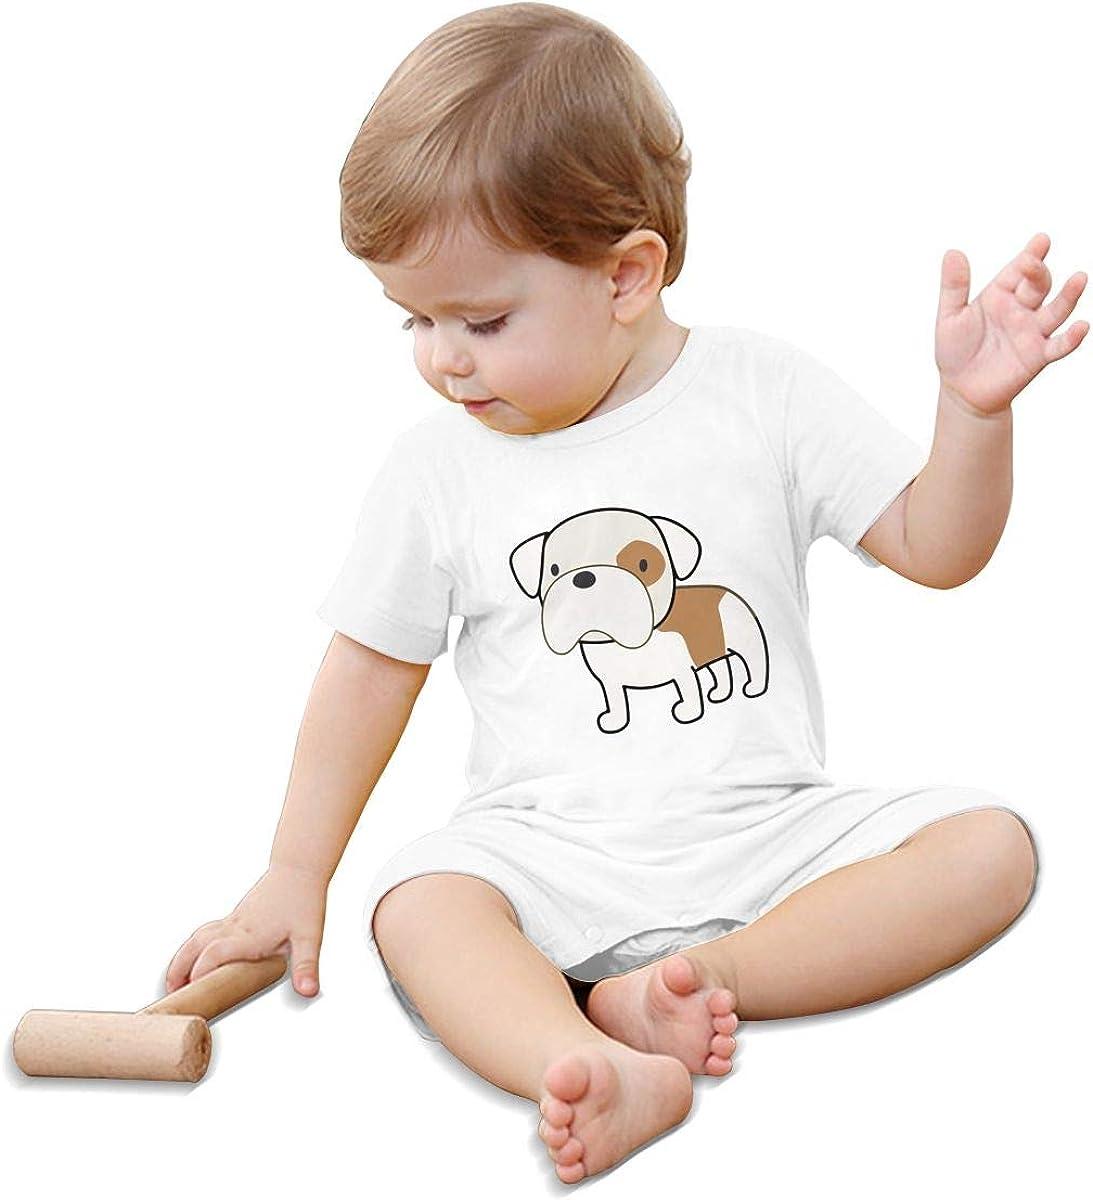 Mri-le1 Newborn Baby Short Sleeved Coveralls Bam Bam English Bulldog Baby Clothes